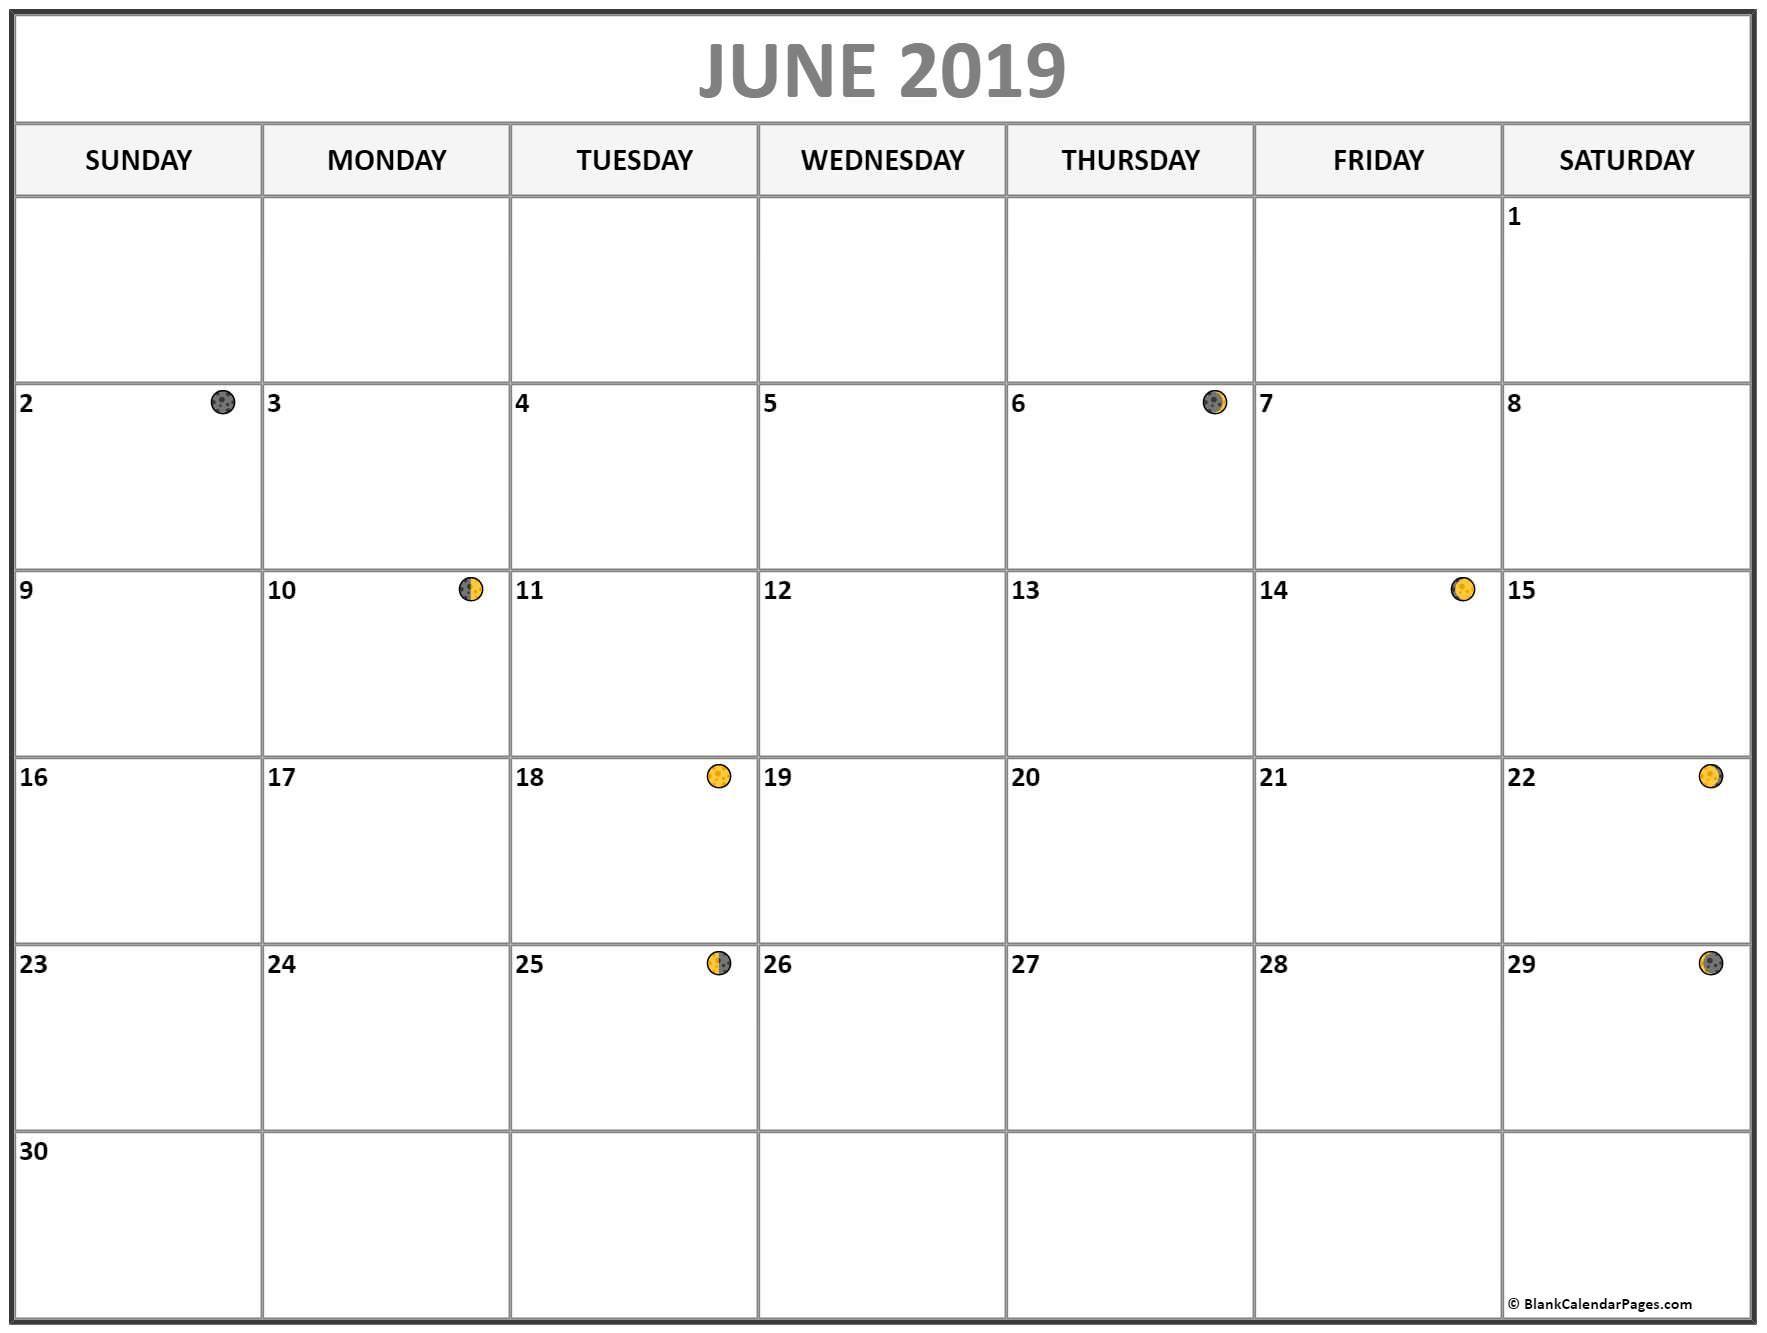 June Moon Calendar June Junecalendar Moonphases